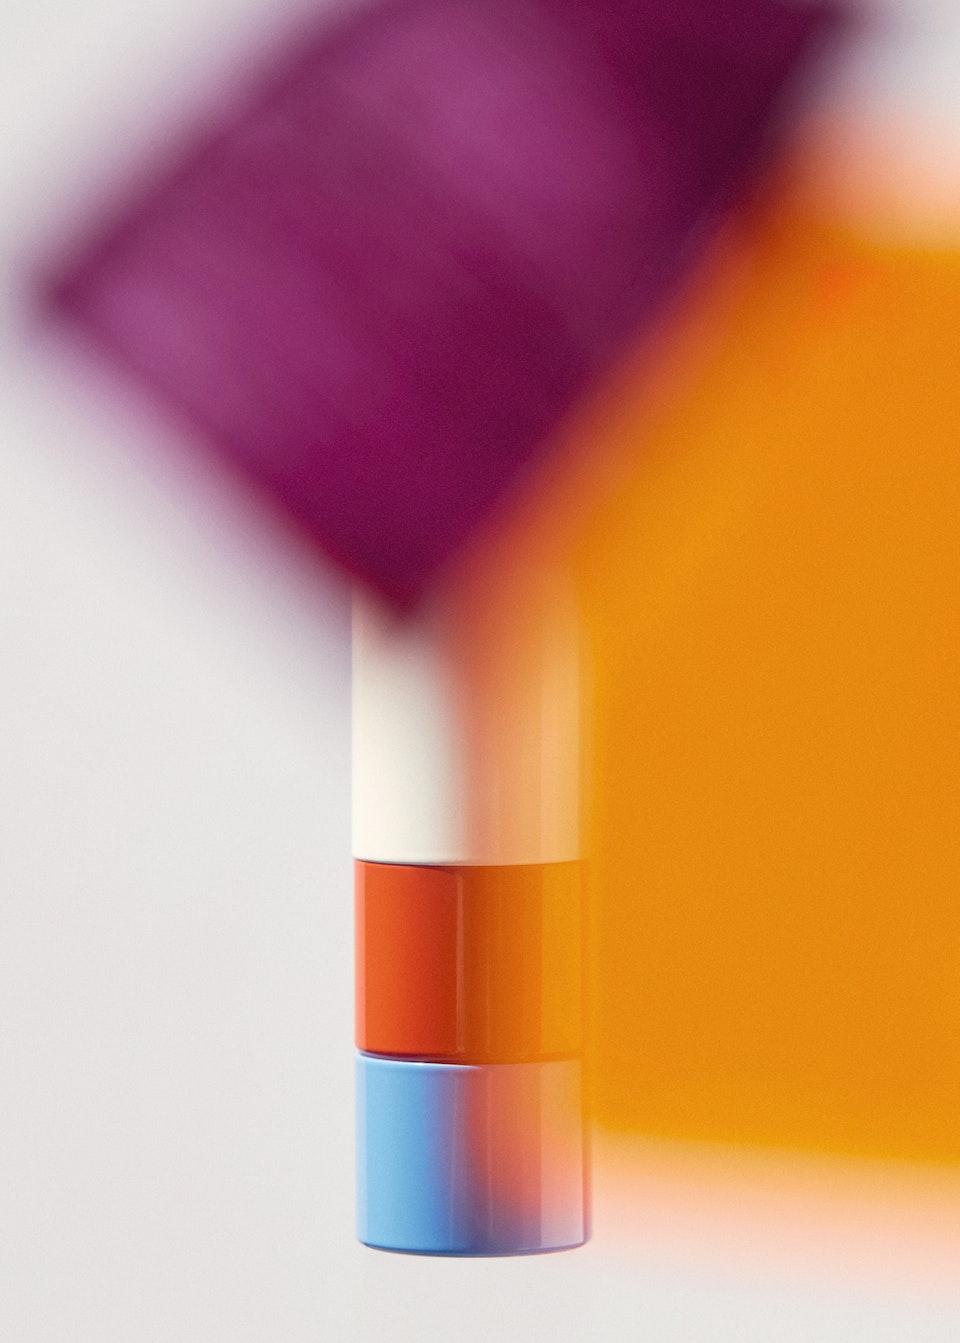 Hermès Liptsick BLOOM_HERMES_RAL_08_new